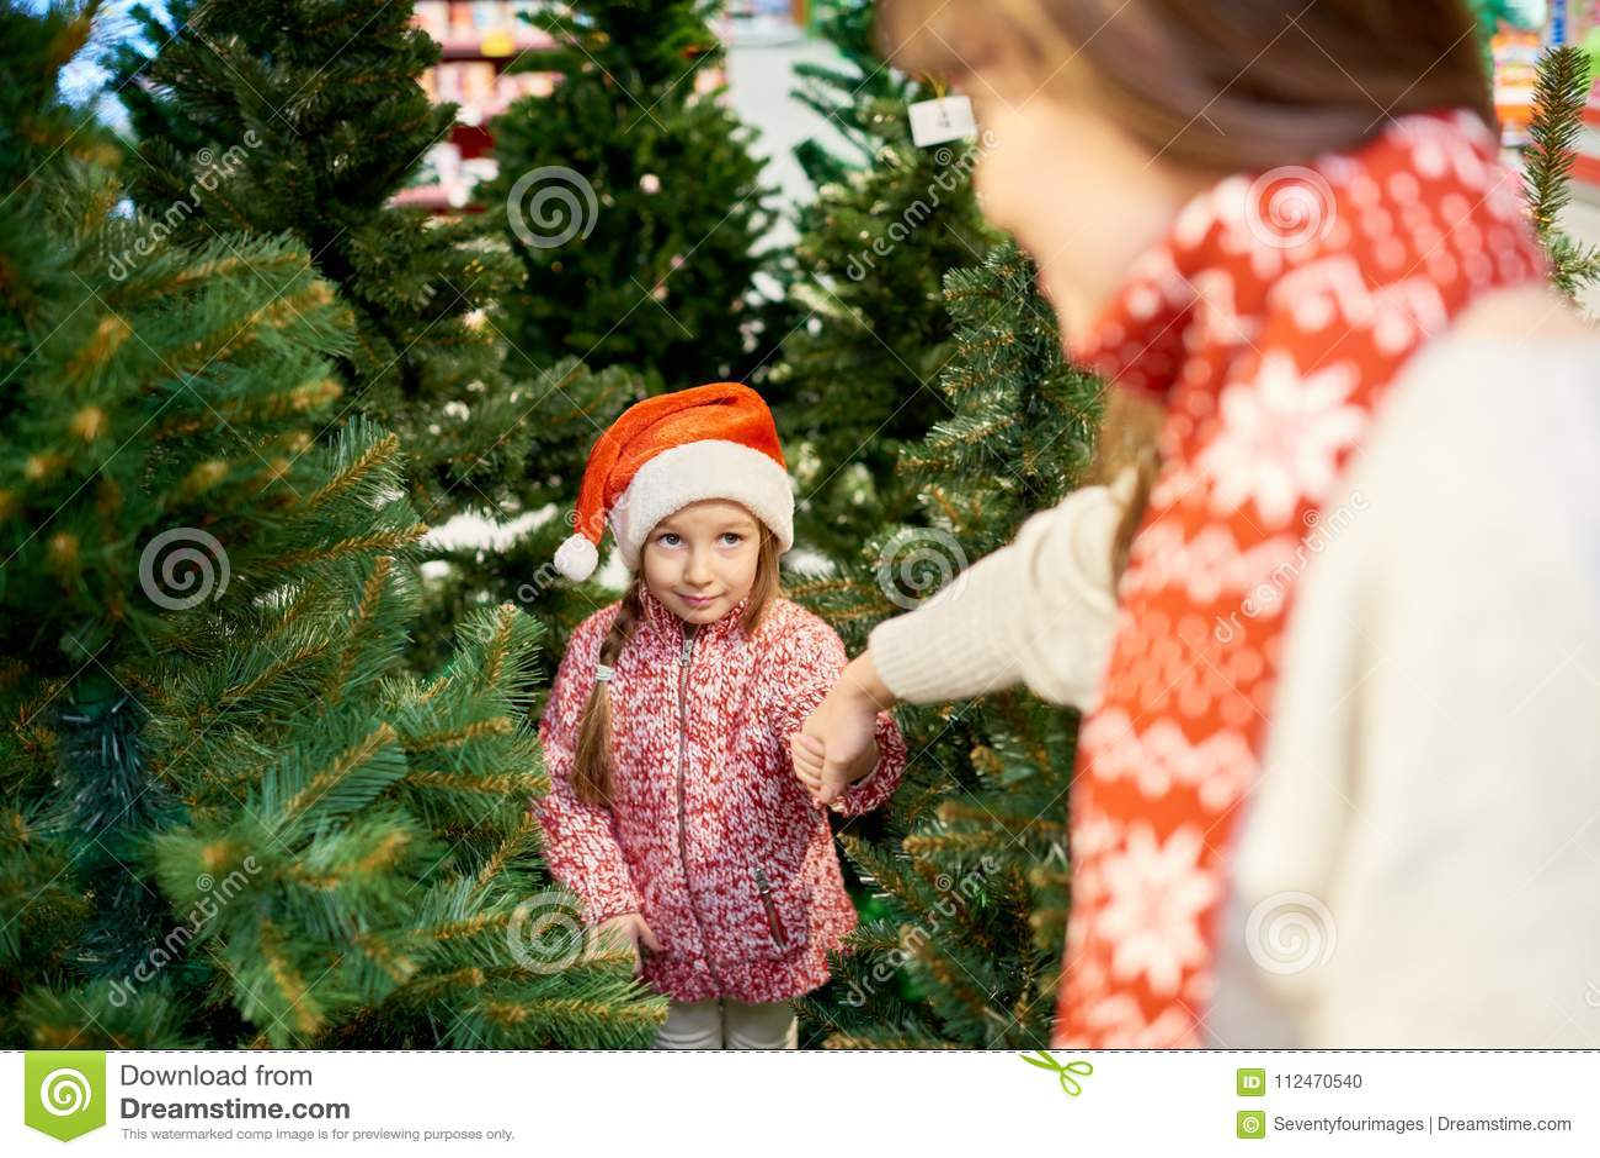 Little Girl Choosing Christmas Tree Stock Photo